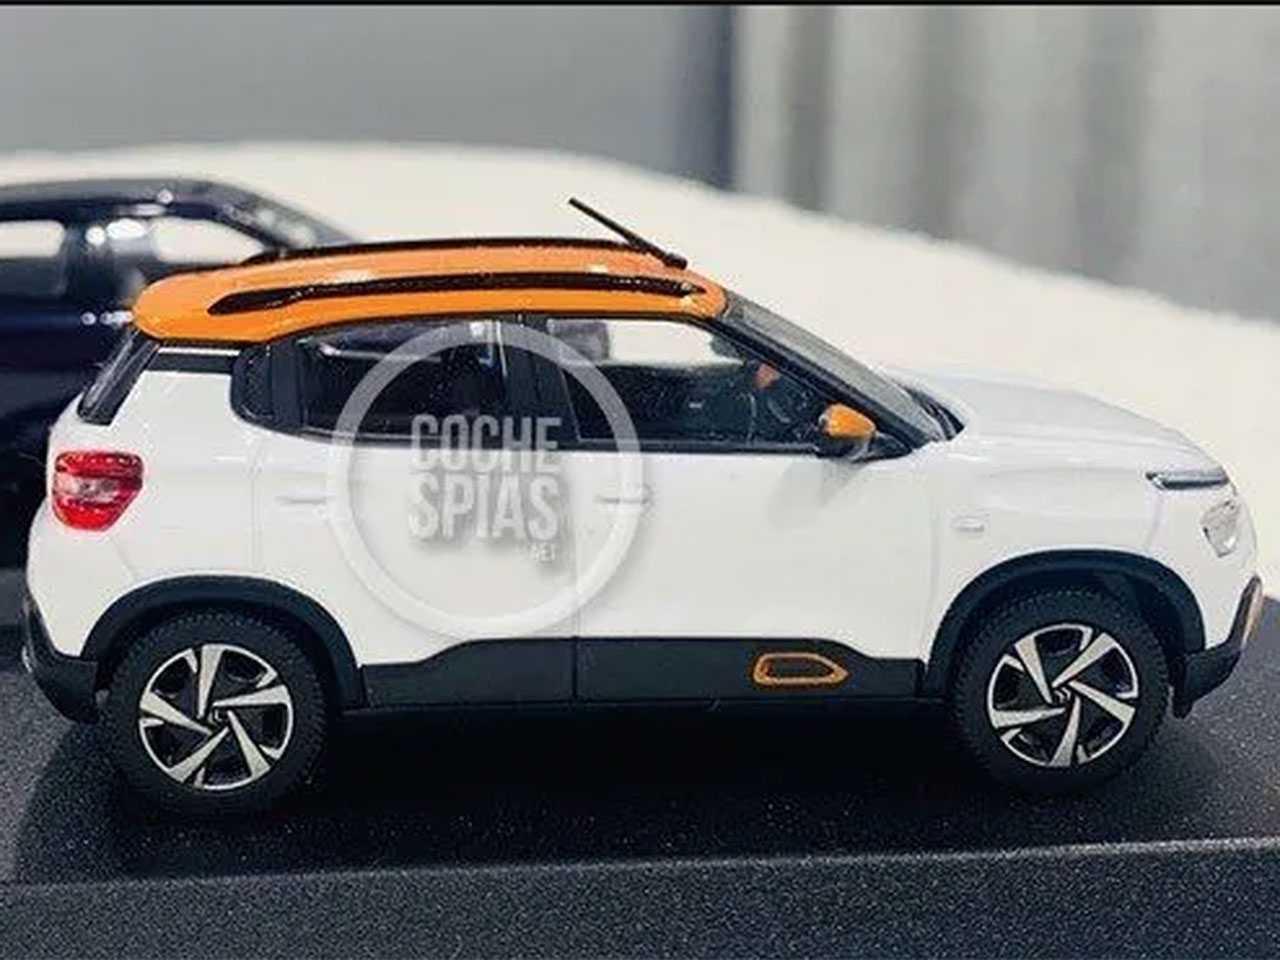 Miniatura antecipando o novo Citroën C3 nacional